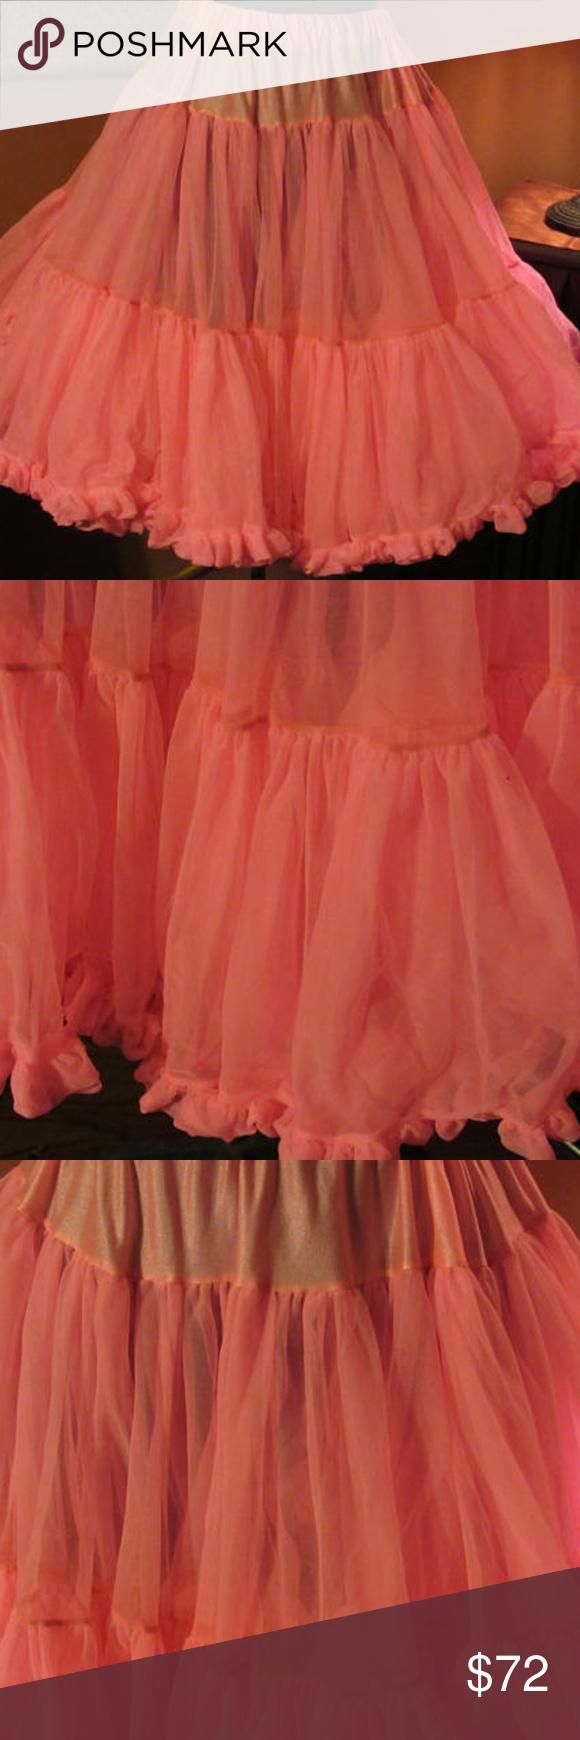 Hot pink and orange dress  Vintage Hot Pink Tier Petticoat  Size Medium  My Posh Picks